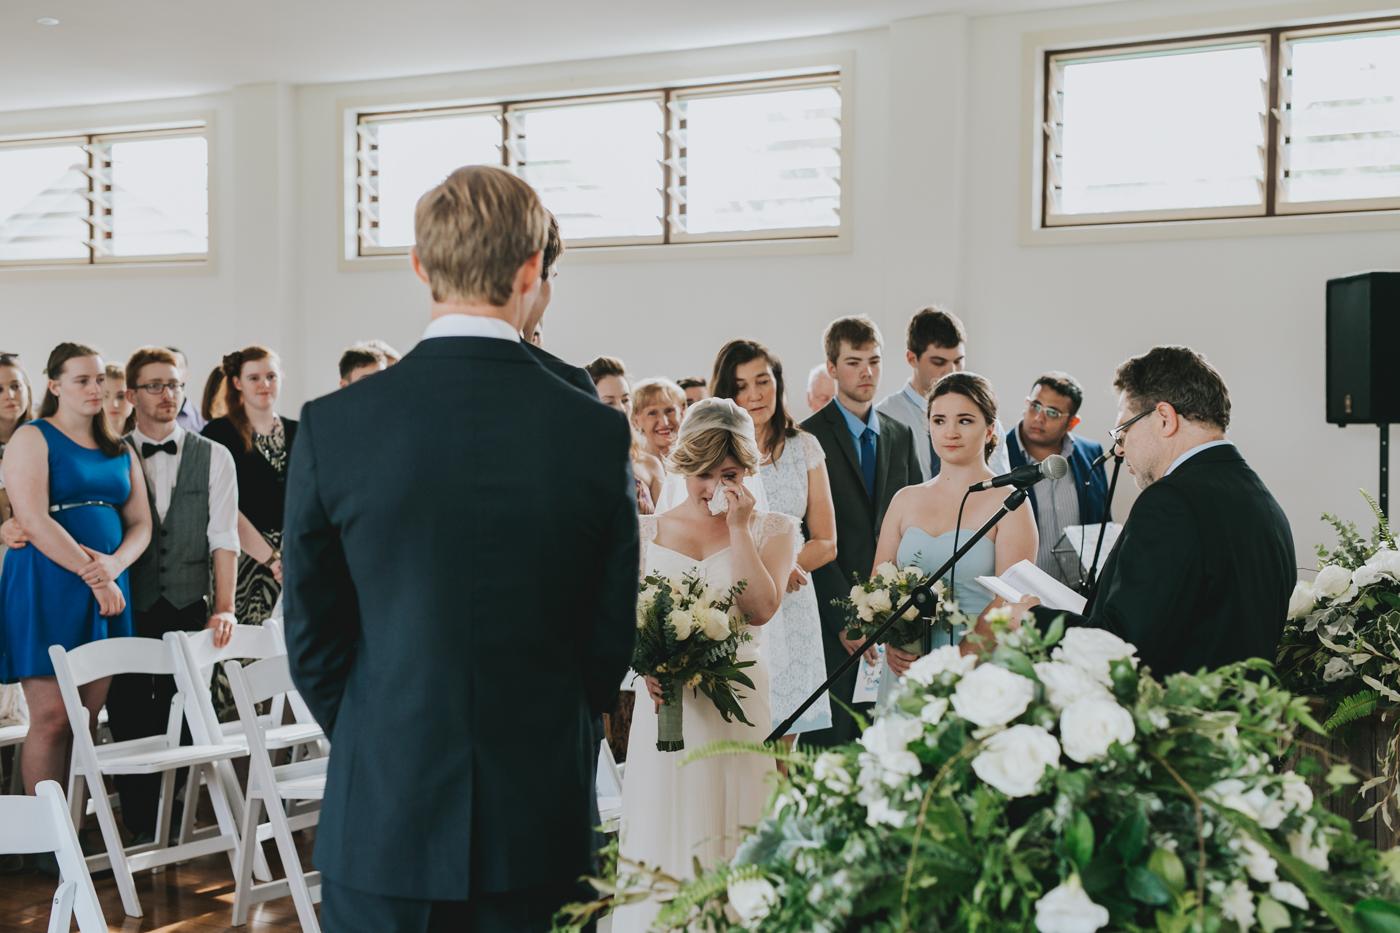 Rachel & Jacob - Willow Farm Berry - South Coast Wedding - Samantha Heather Photography-68.jpg